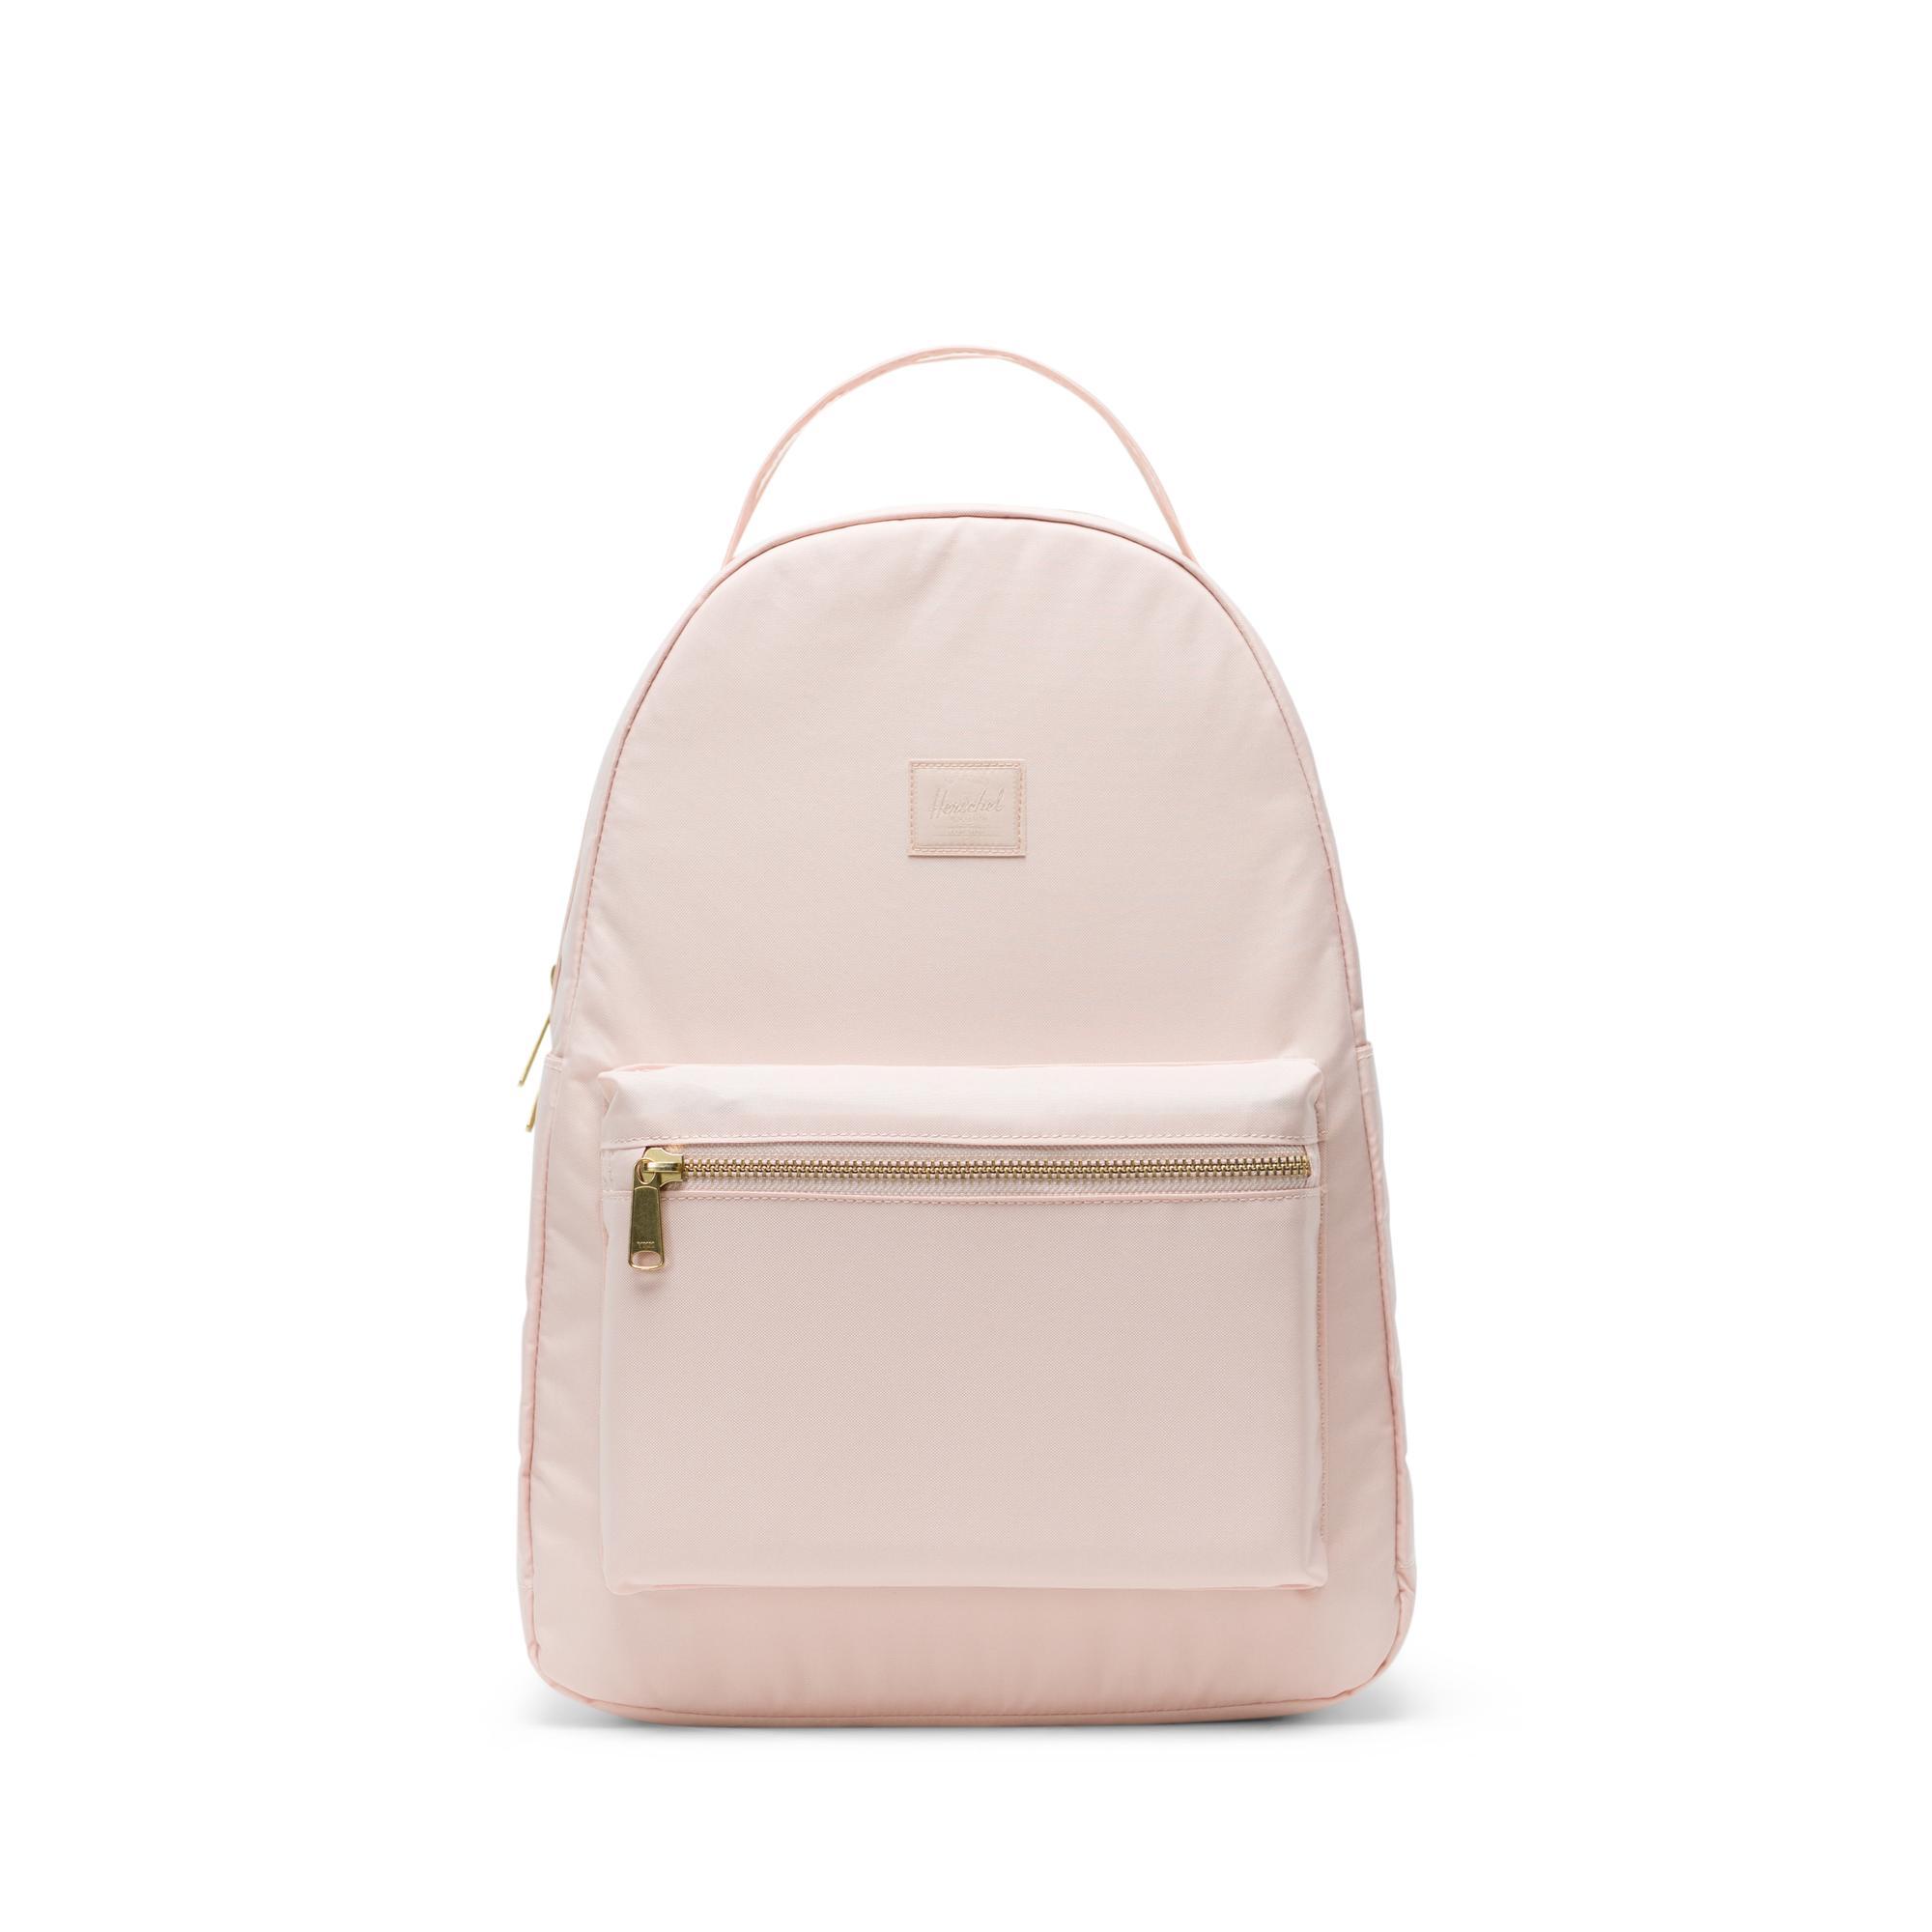 Nova Backpack Mid-Volume Light  a75c5e3a77cb6